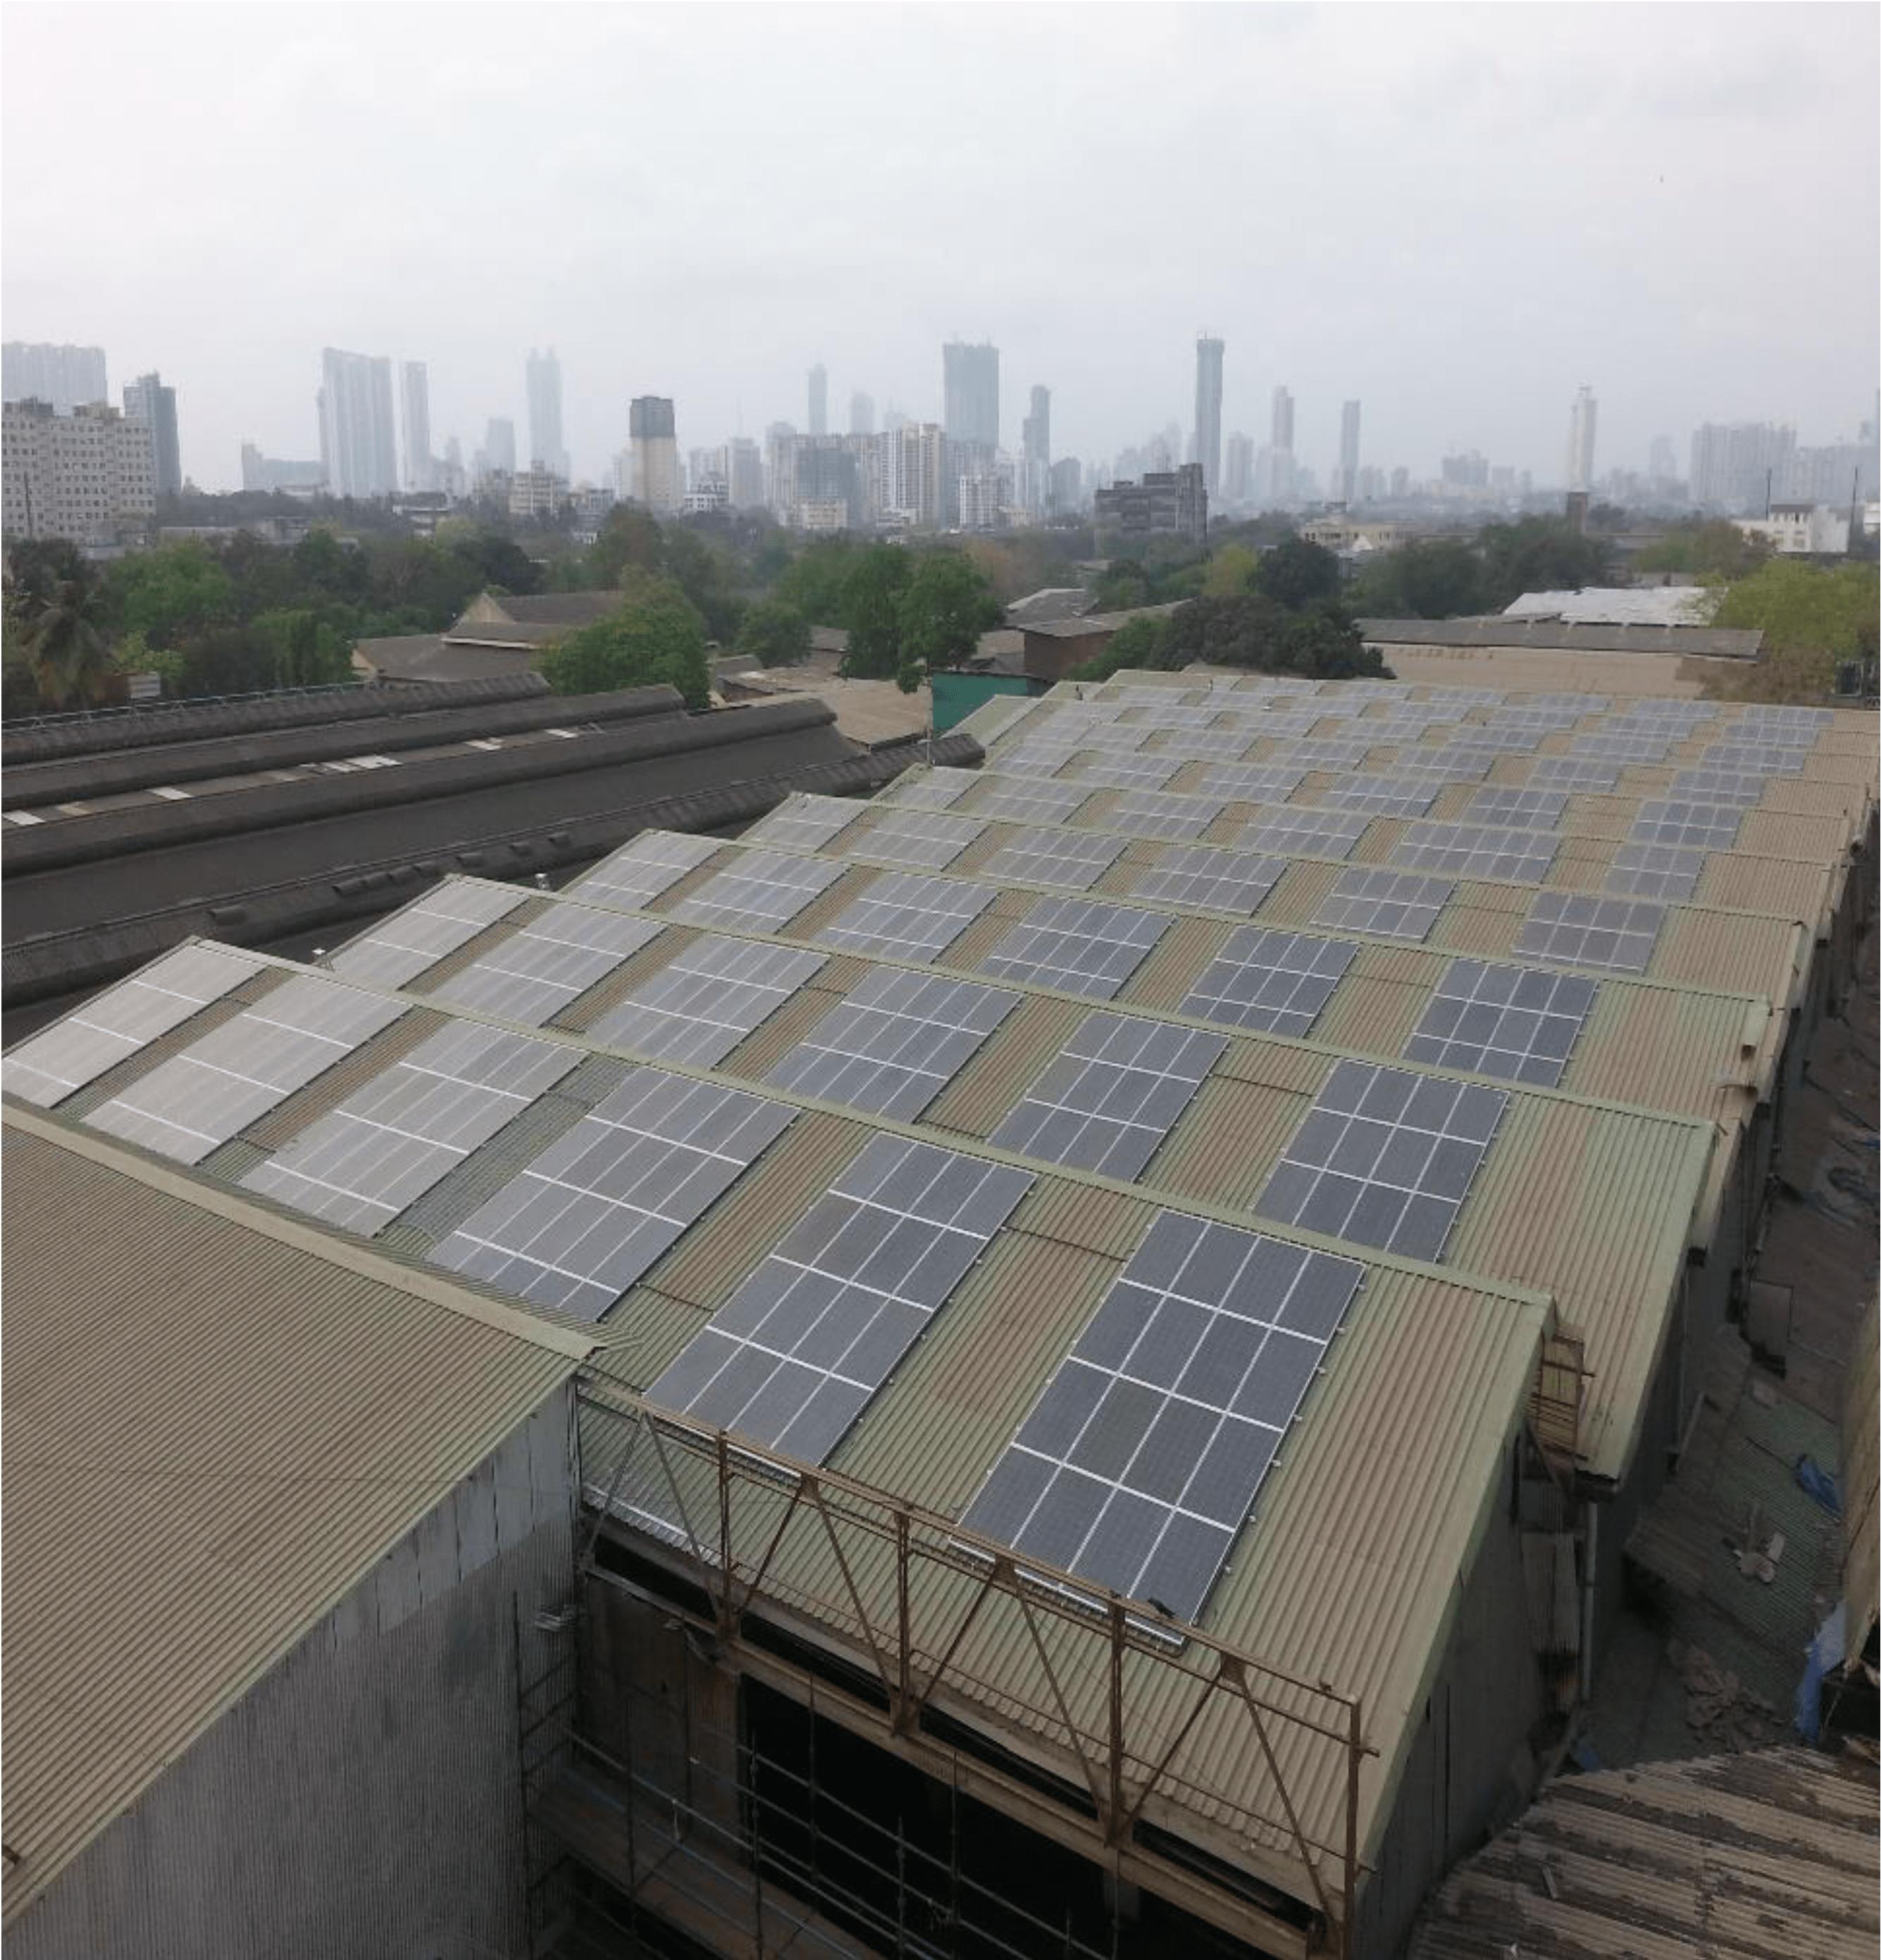 350 kWp, Shipbuilding Company, Mumbai (MH)